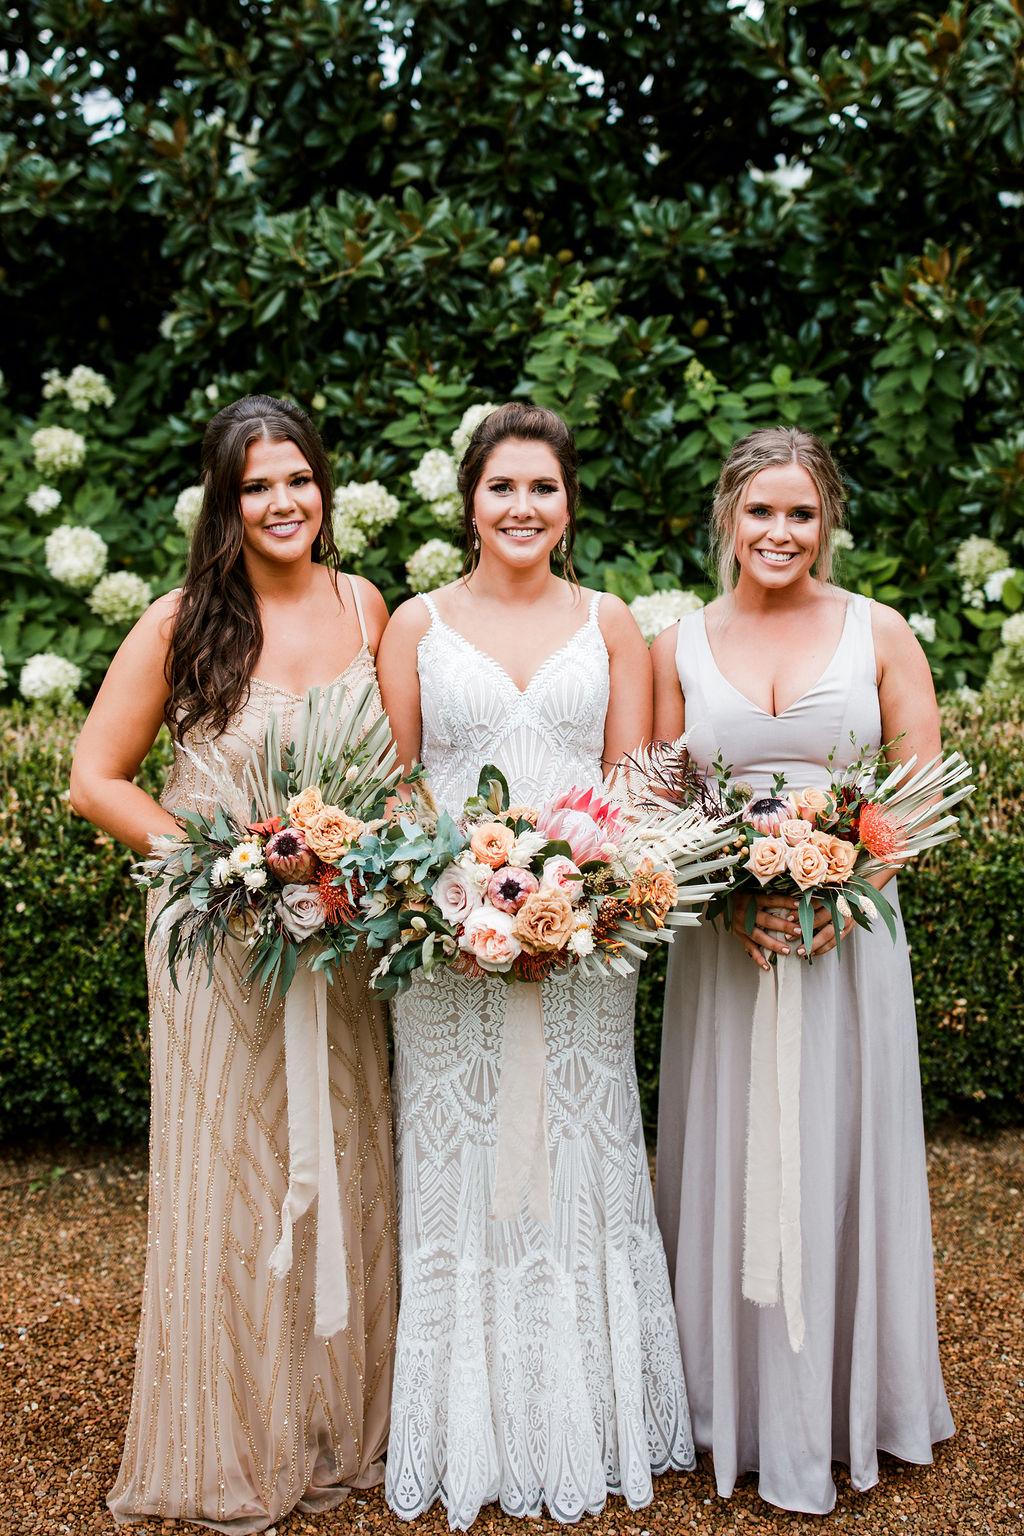 John Myers Photography Nashville Wedding Photographer | Nashville Bride Guide